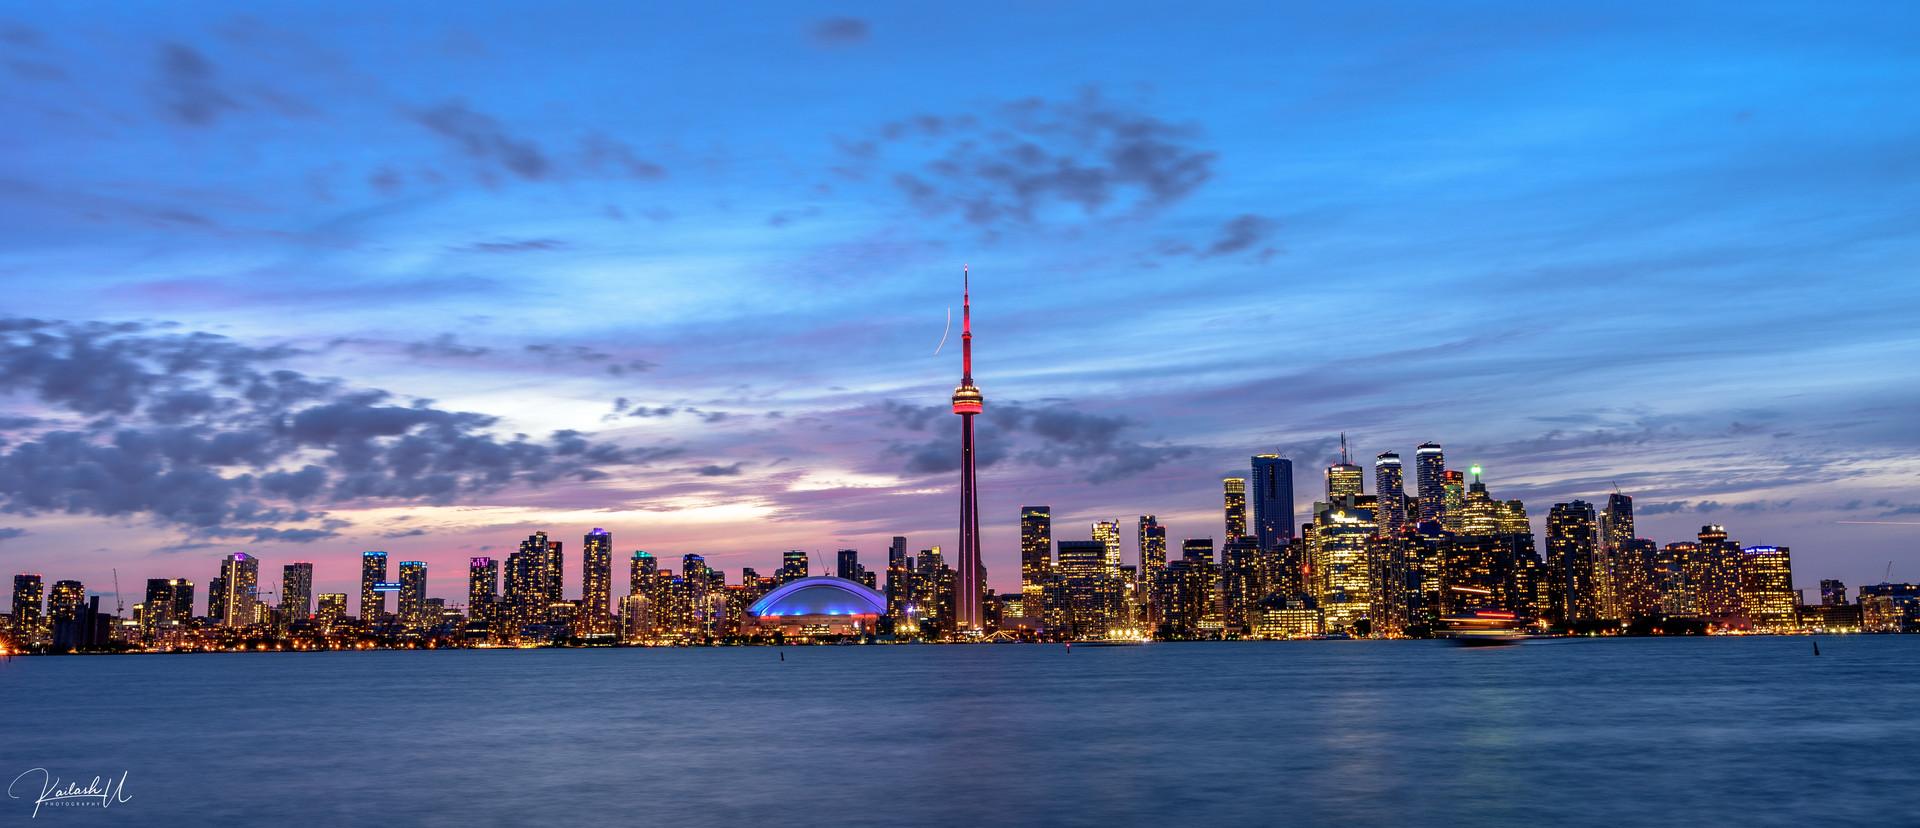 Olympic Island, Toronto